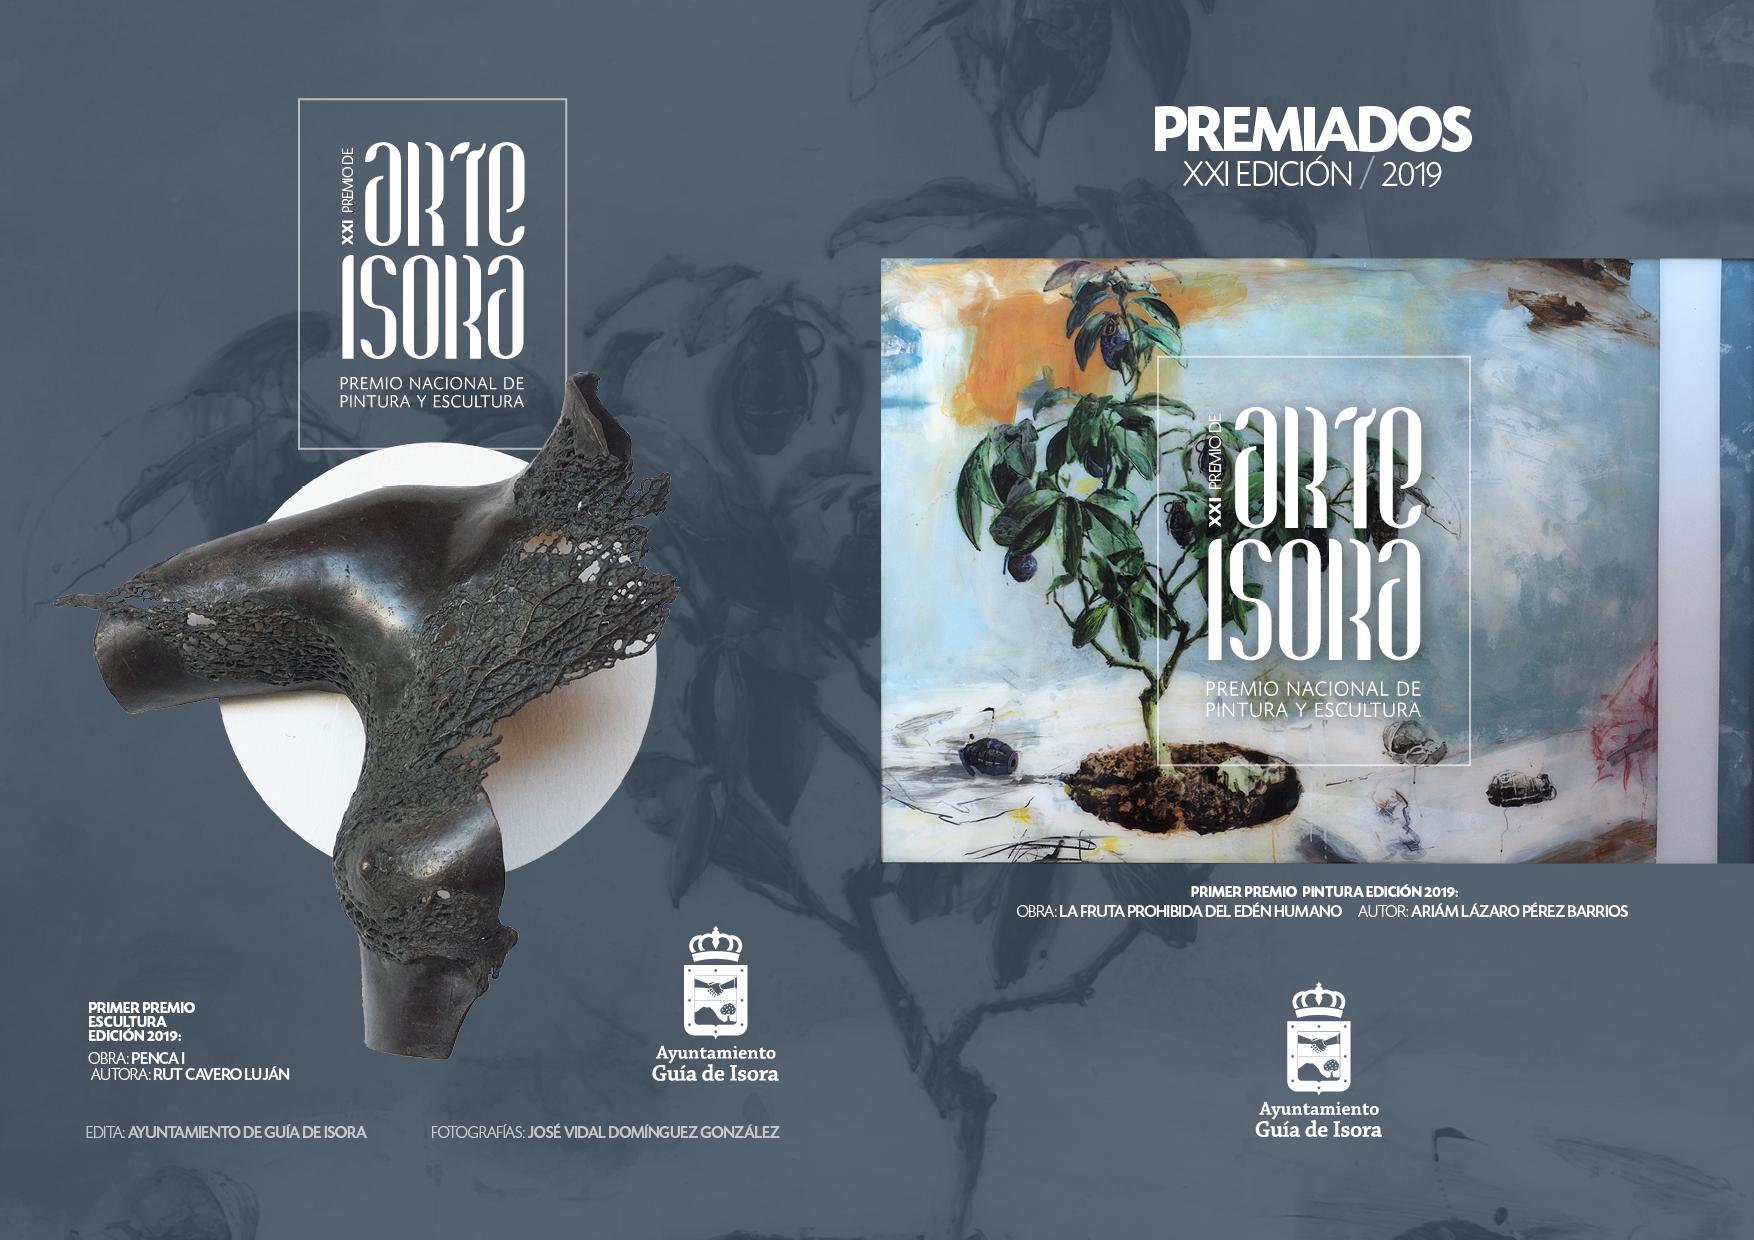 dip_premios_arteisora19_A41